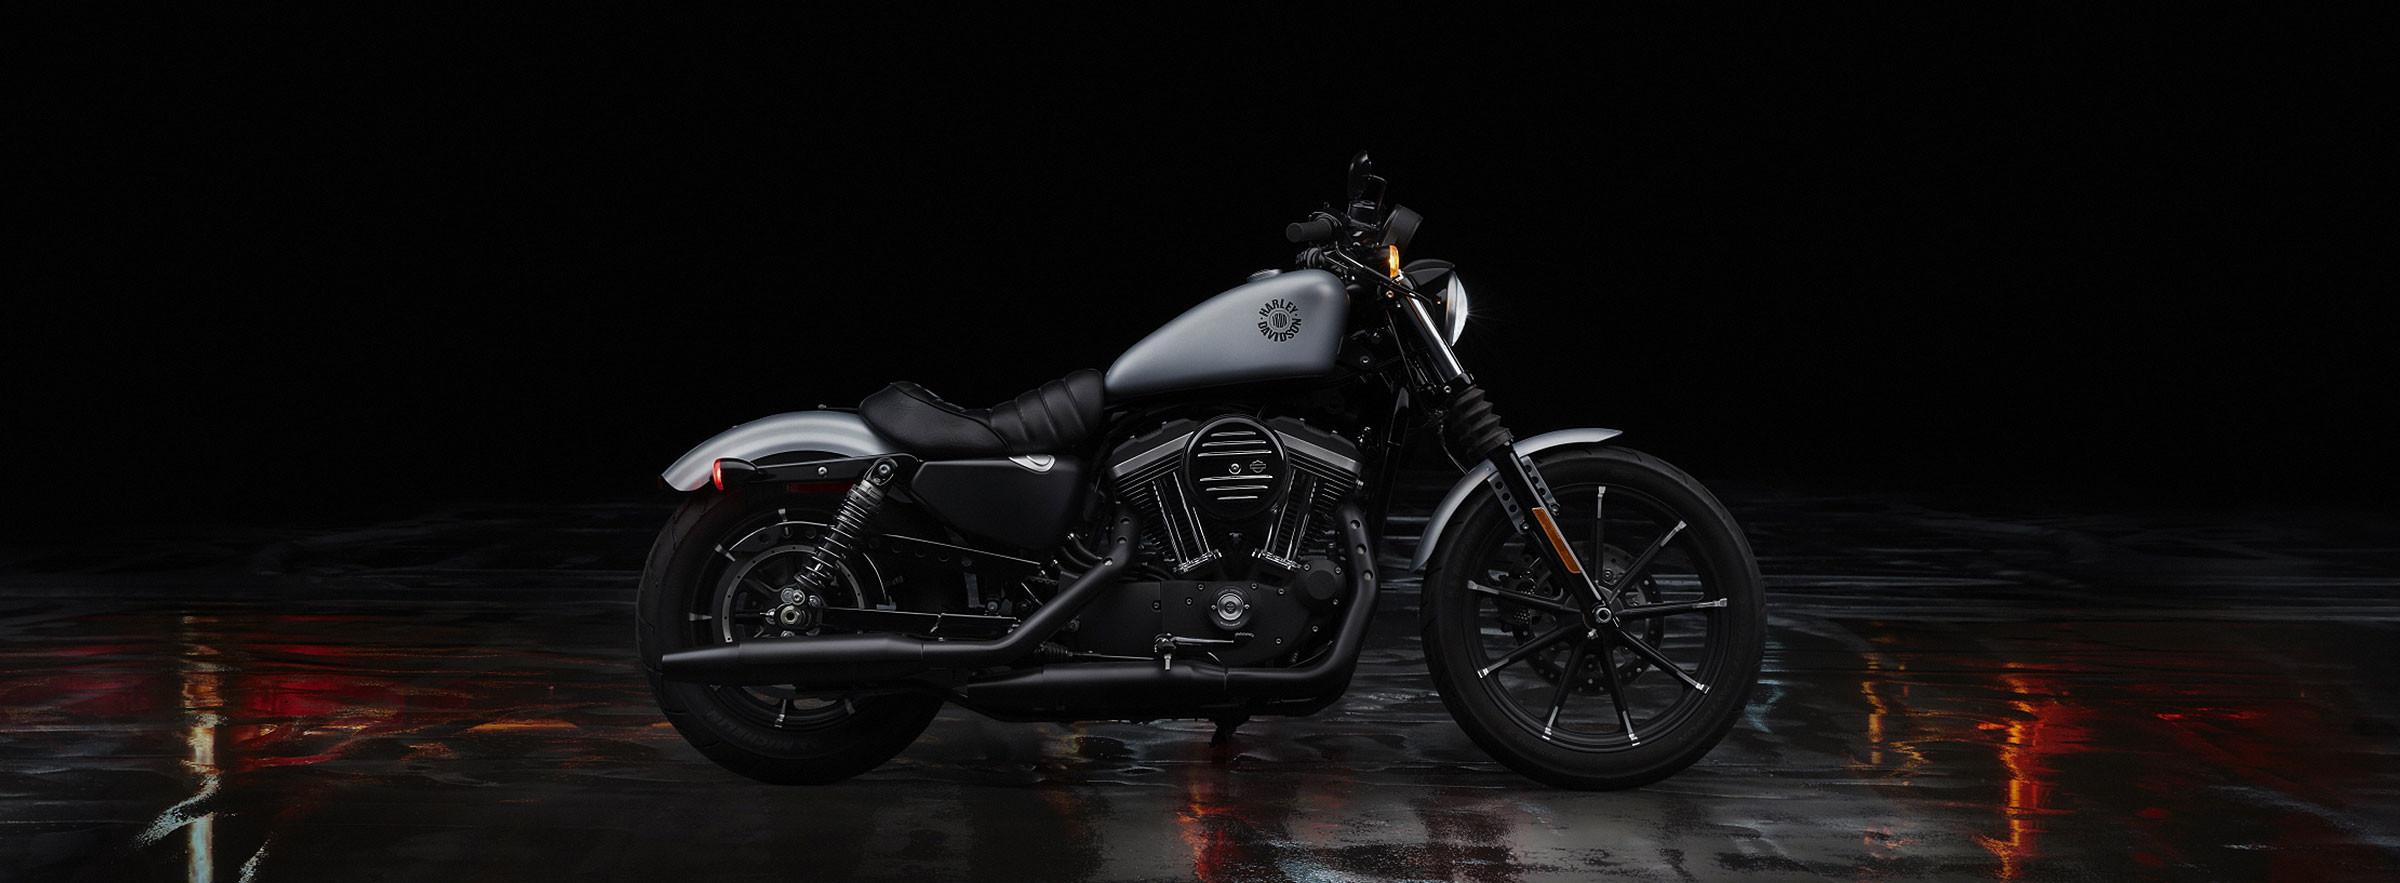 Iron 883™ | Freedom Valley Harley-Davidson®